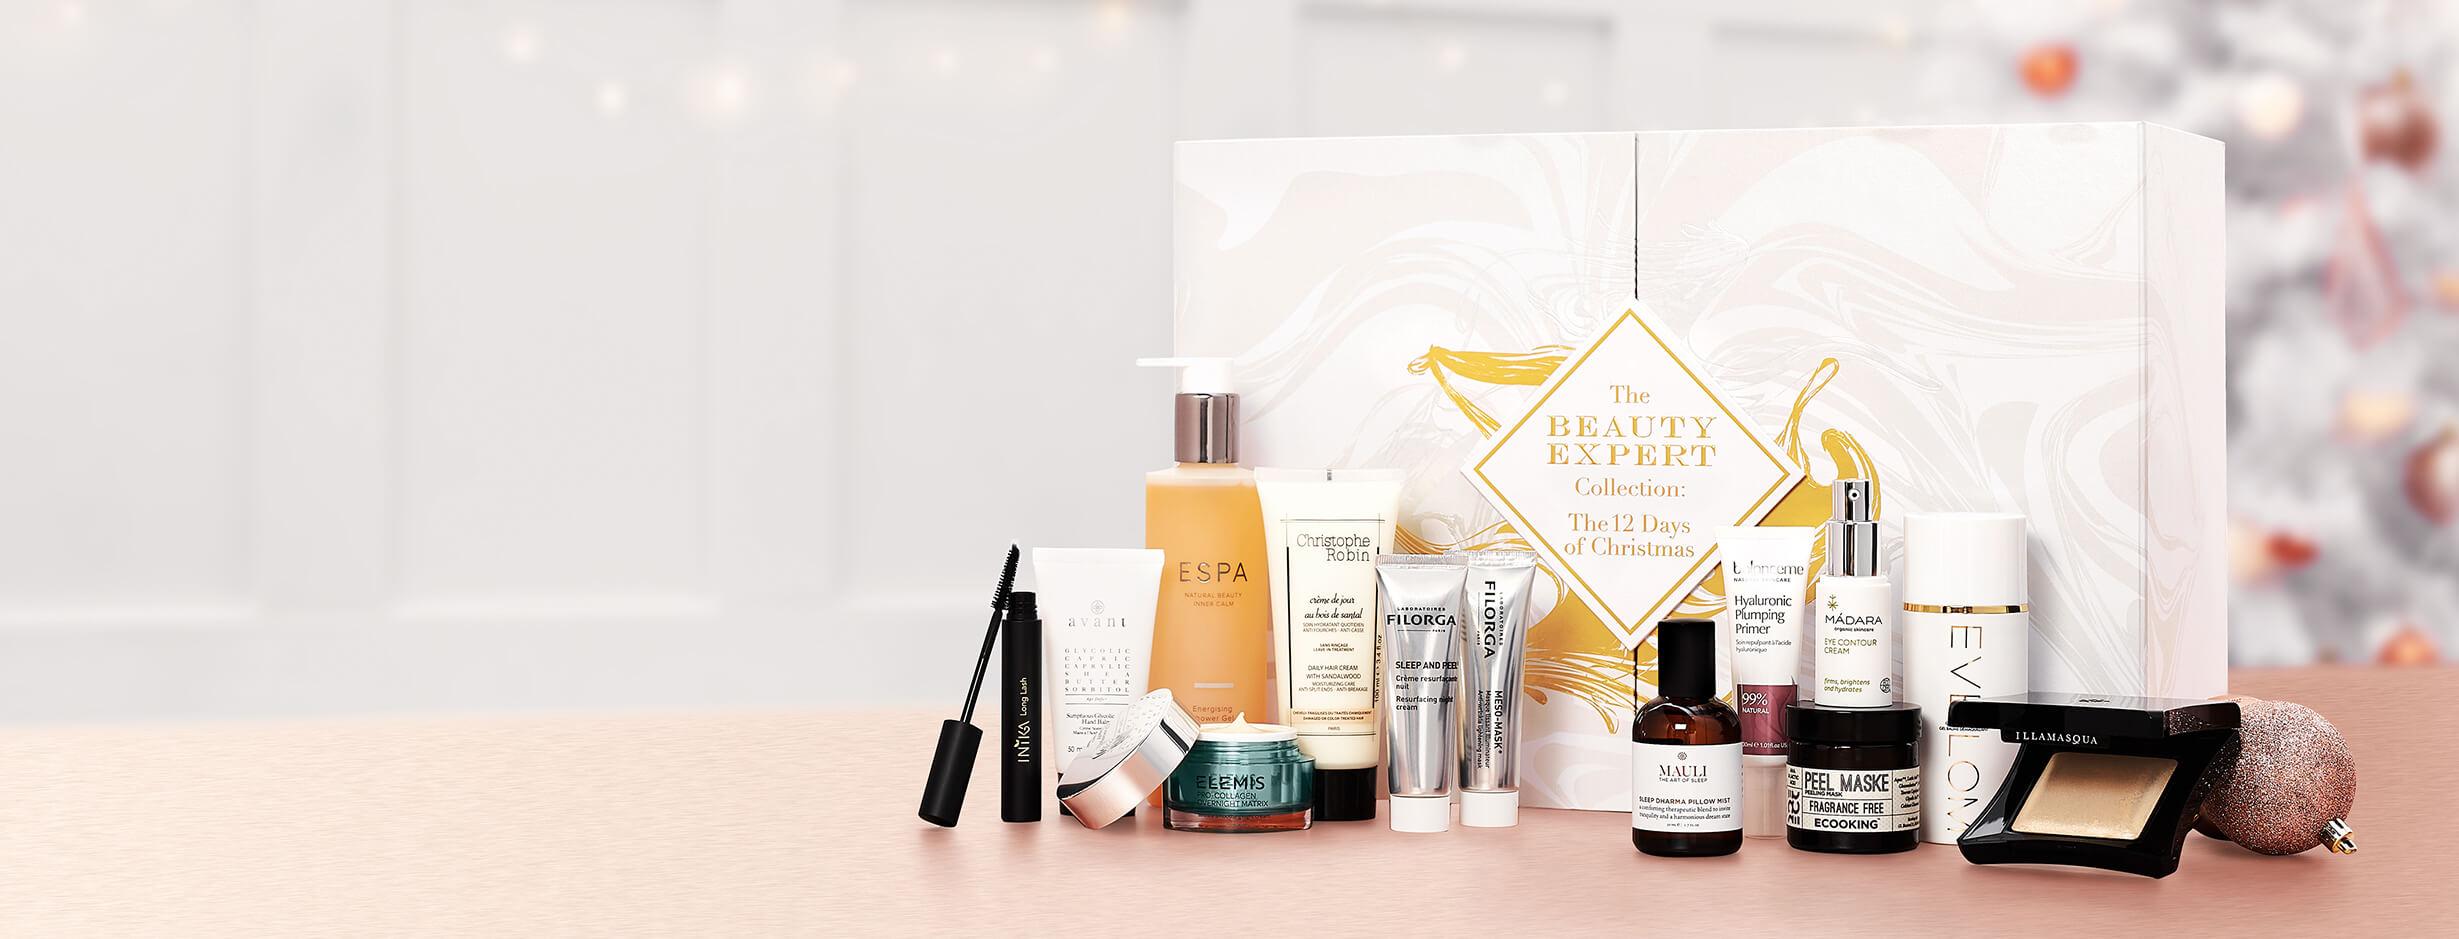 Beauty Expert 12 Days of Christmas Advent Calendar 2020 Contents Reveal!